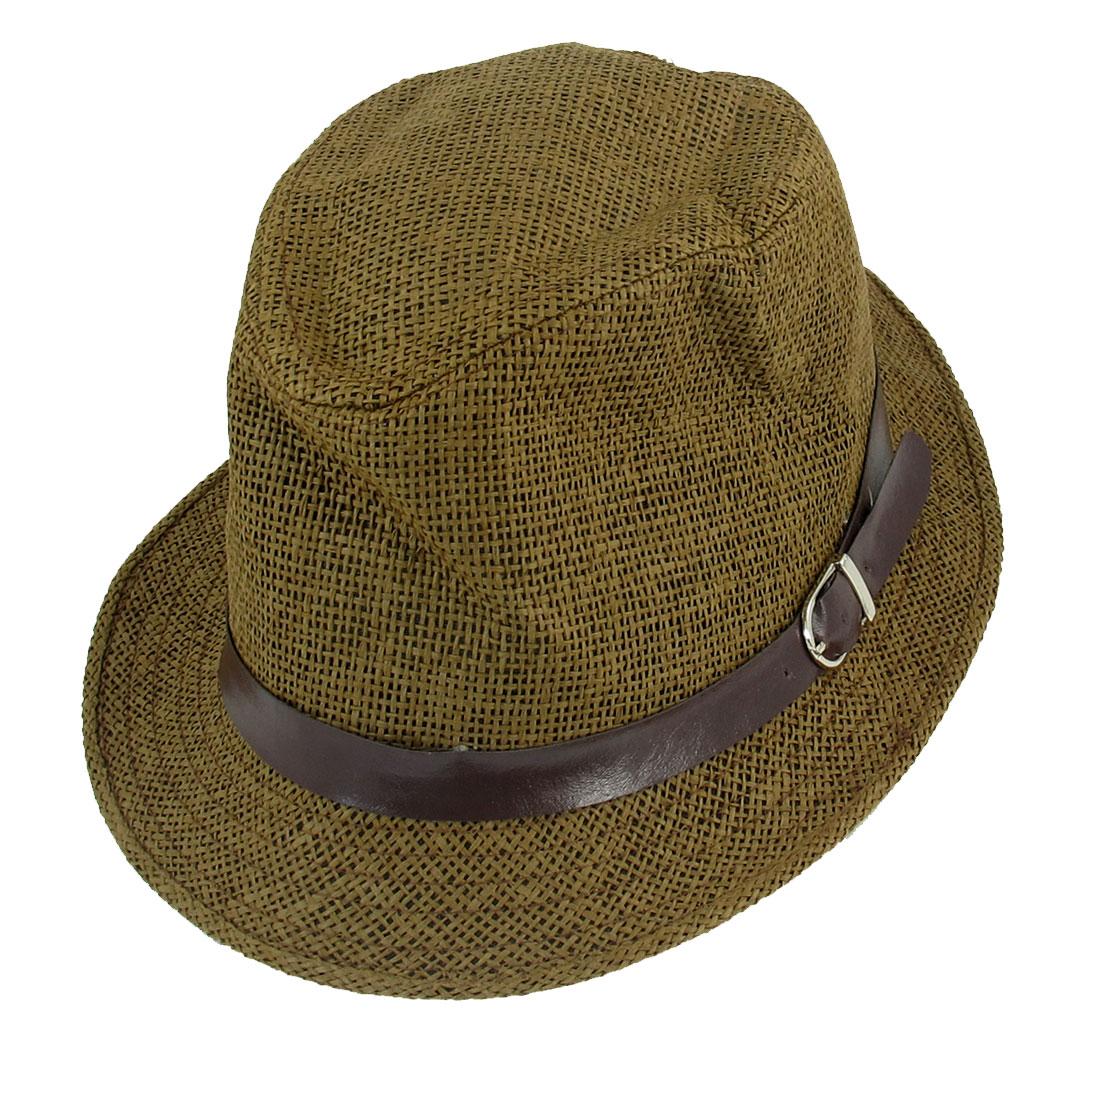 Band Decor Khaki Straw Braid Fedora Trilby Hat for Men Women